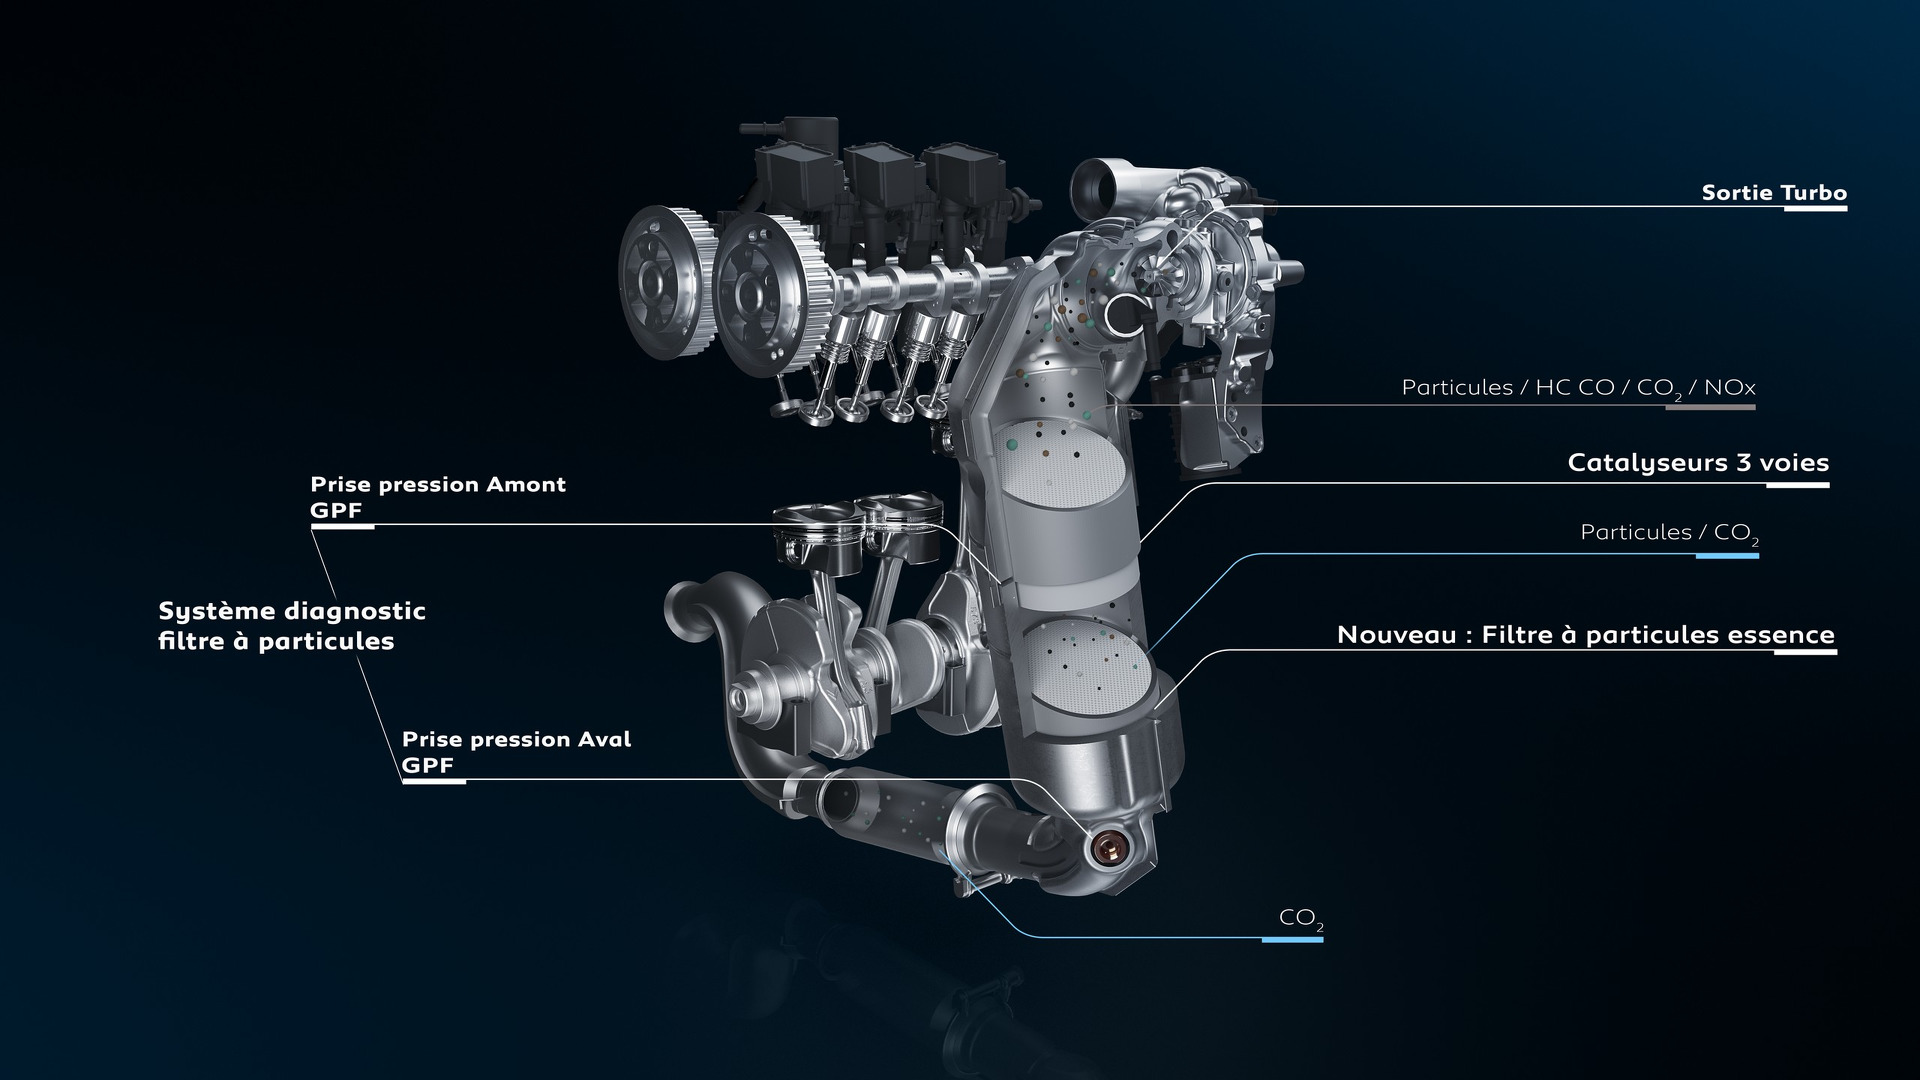 2018-peugeot-308-facelift (5)